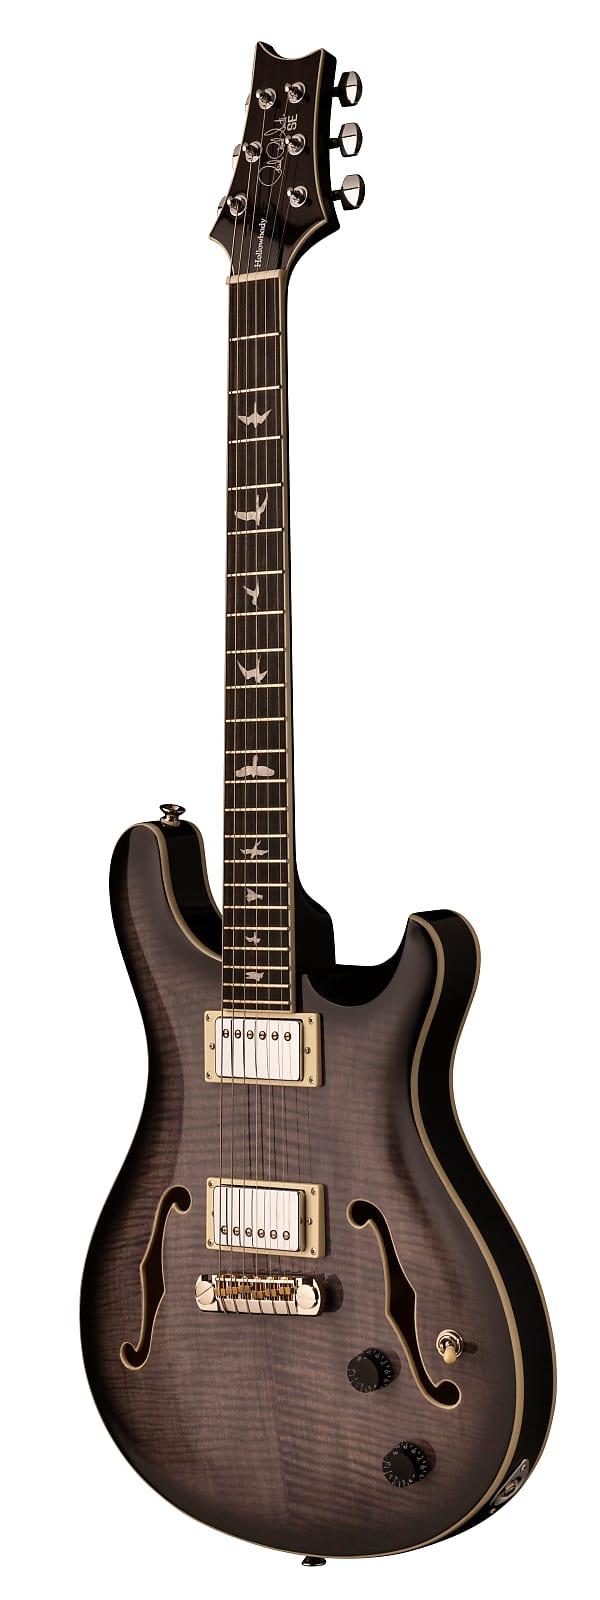 Paul Reed Smith PRS SE Hollowbody II Electric Guitar Charcoal Burst w/ Hardshel